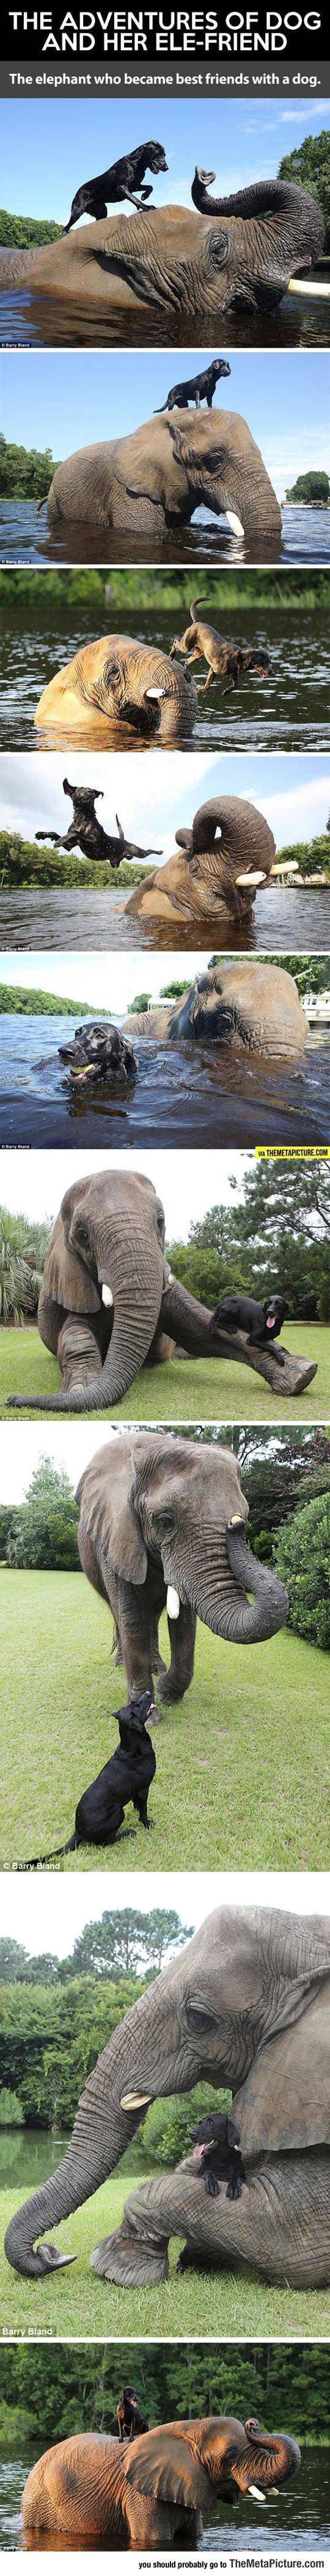 funny-dog-elephant-adventures